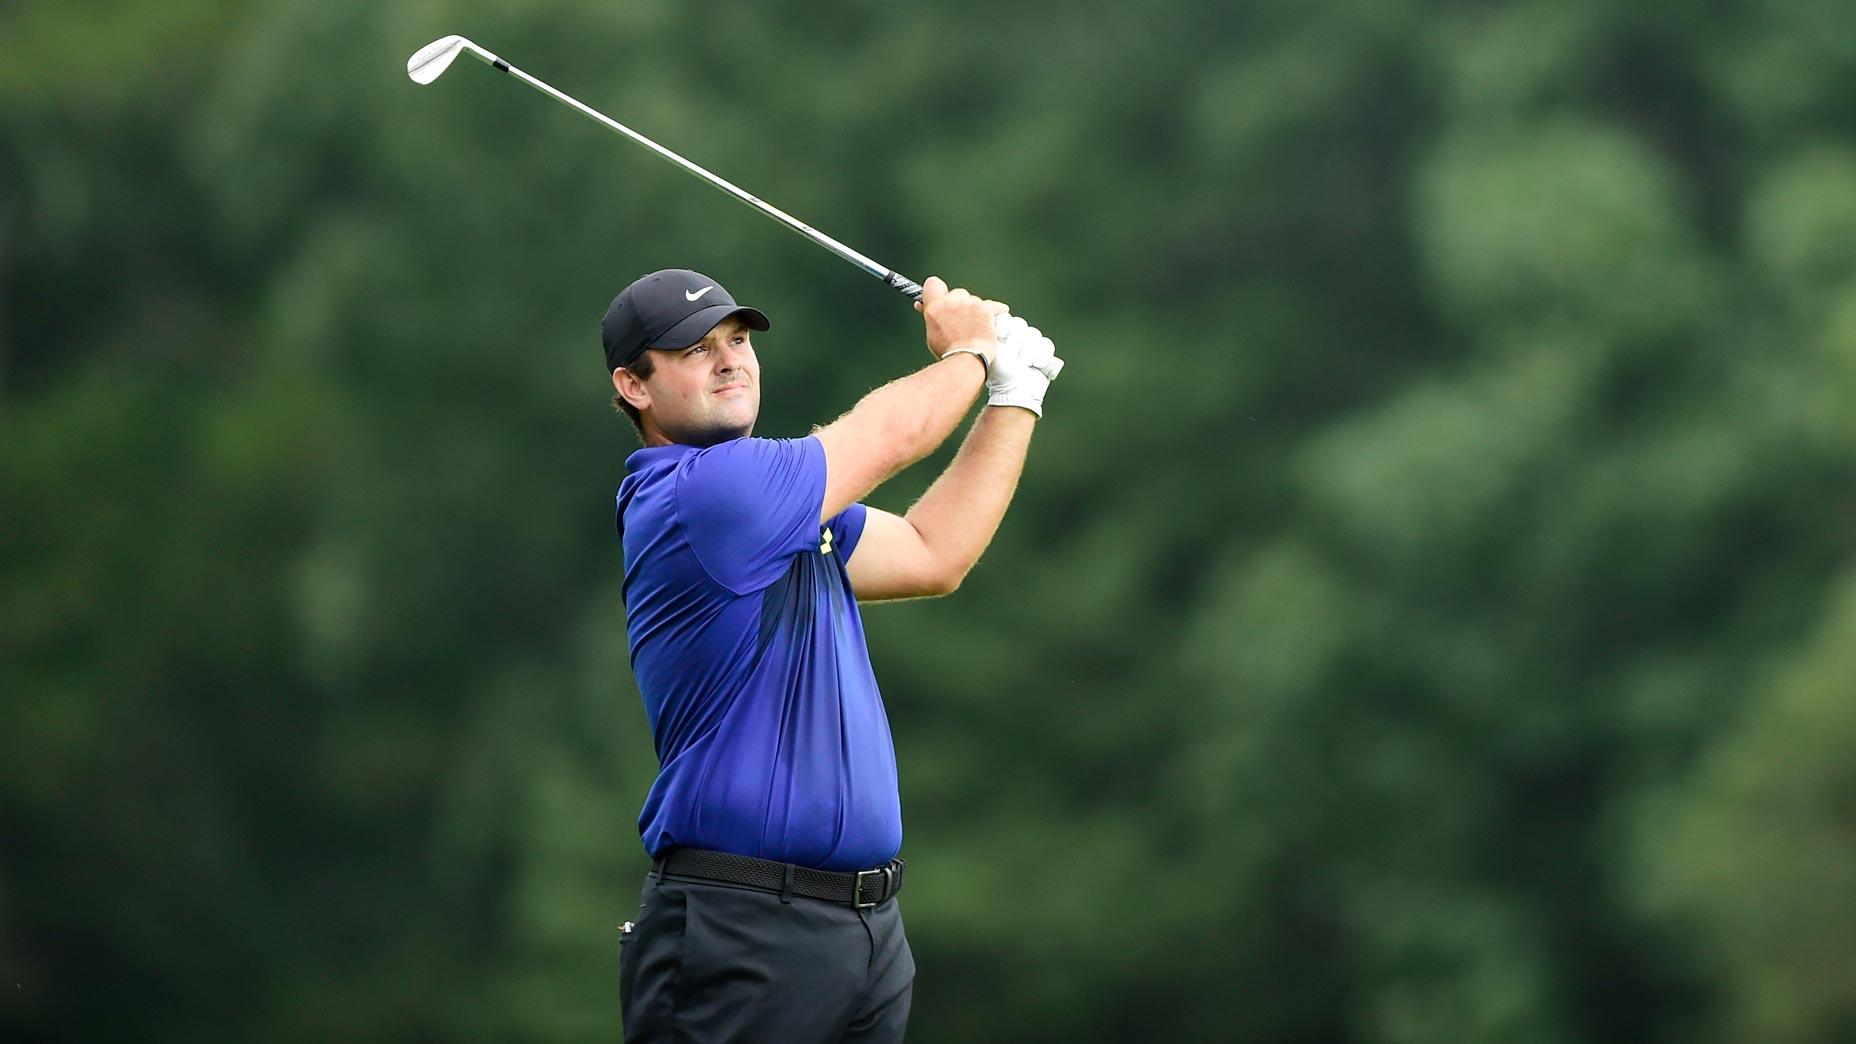 Pro golfer Patrick Reed at 2020 Wyndham Championship